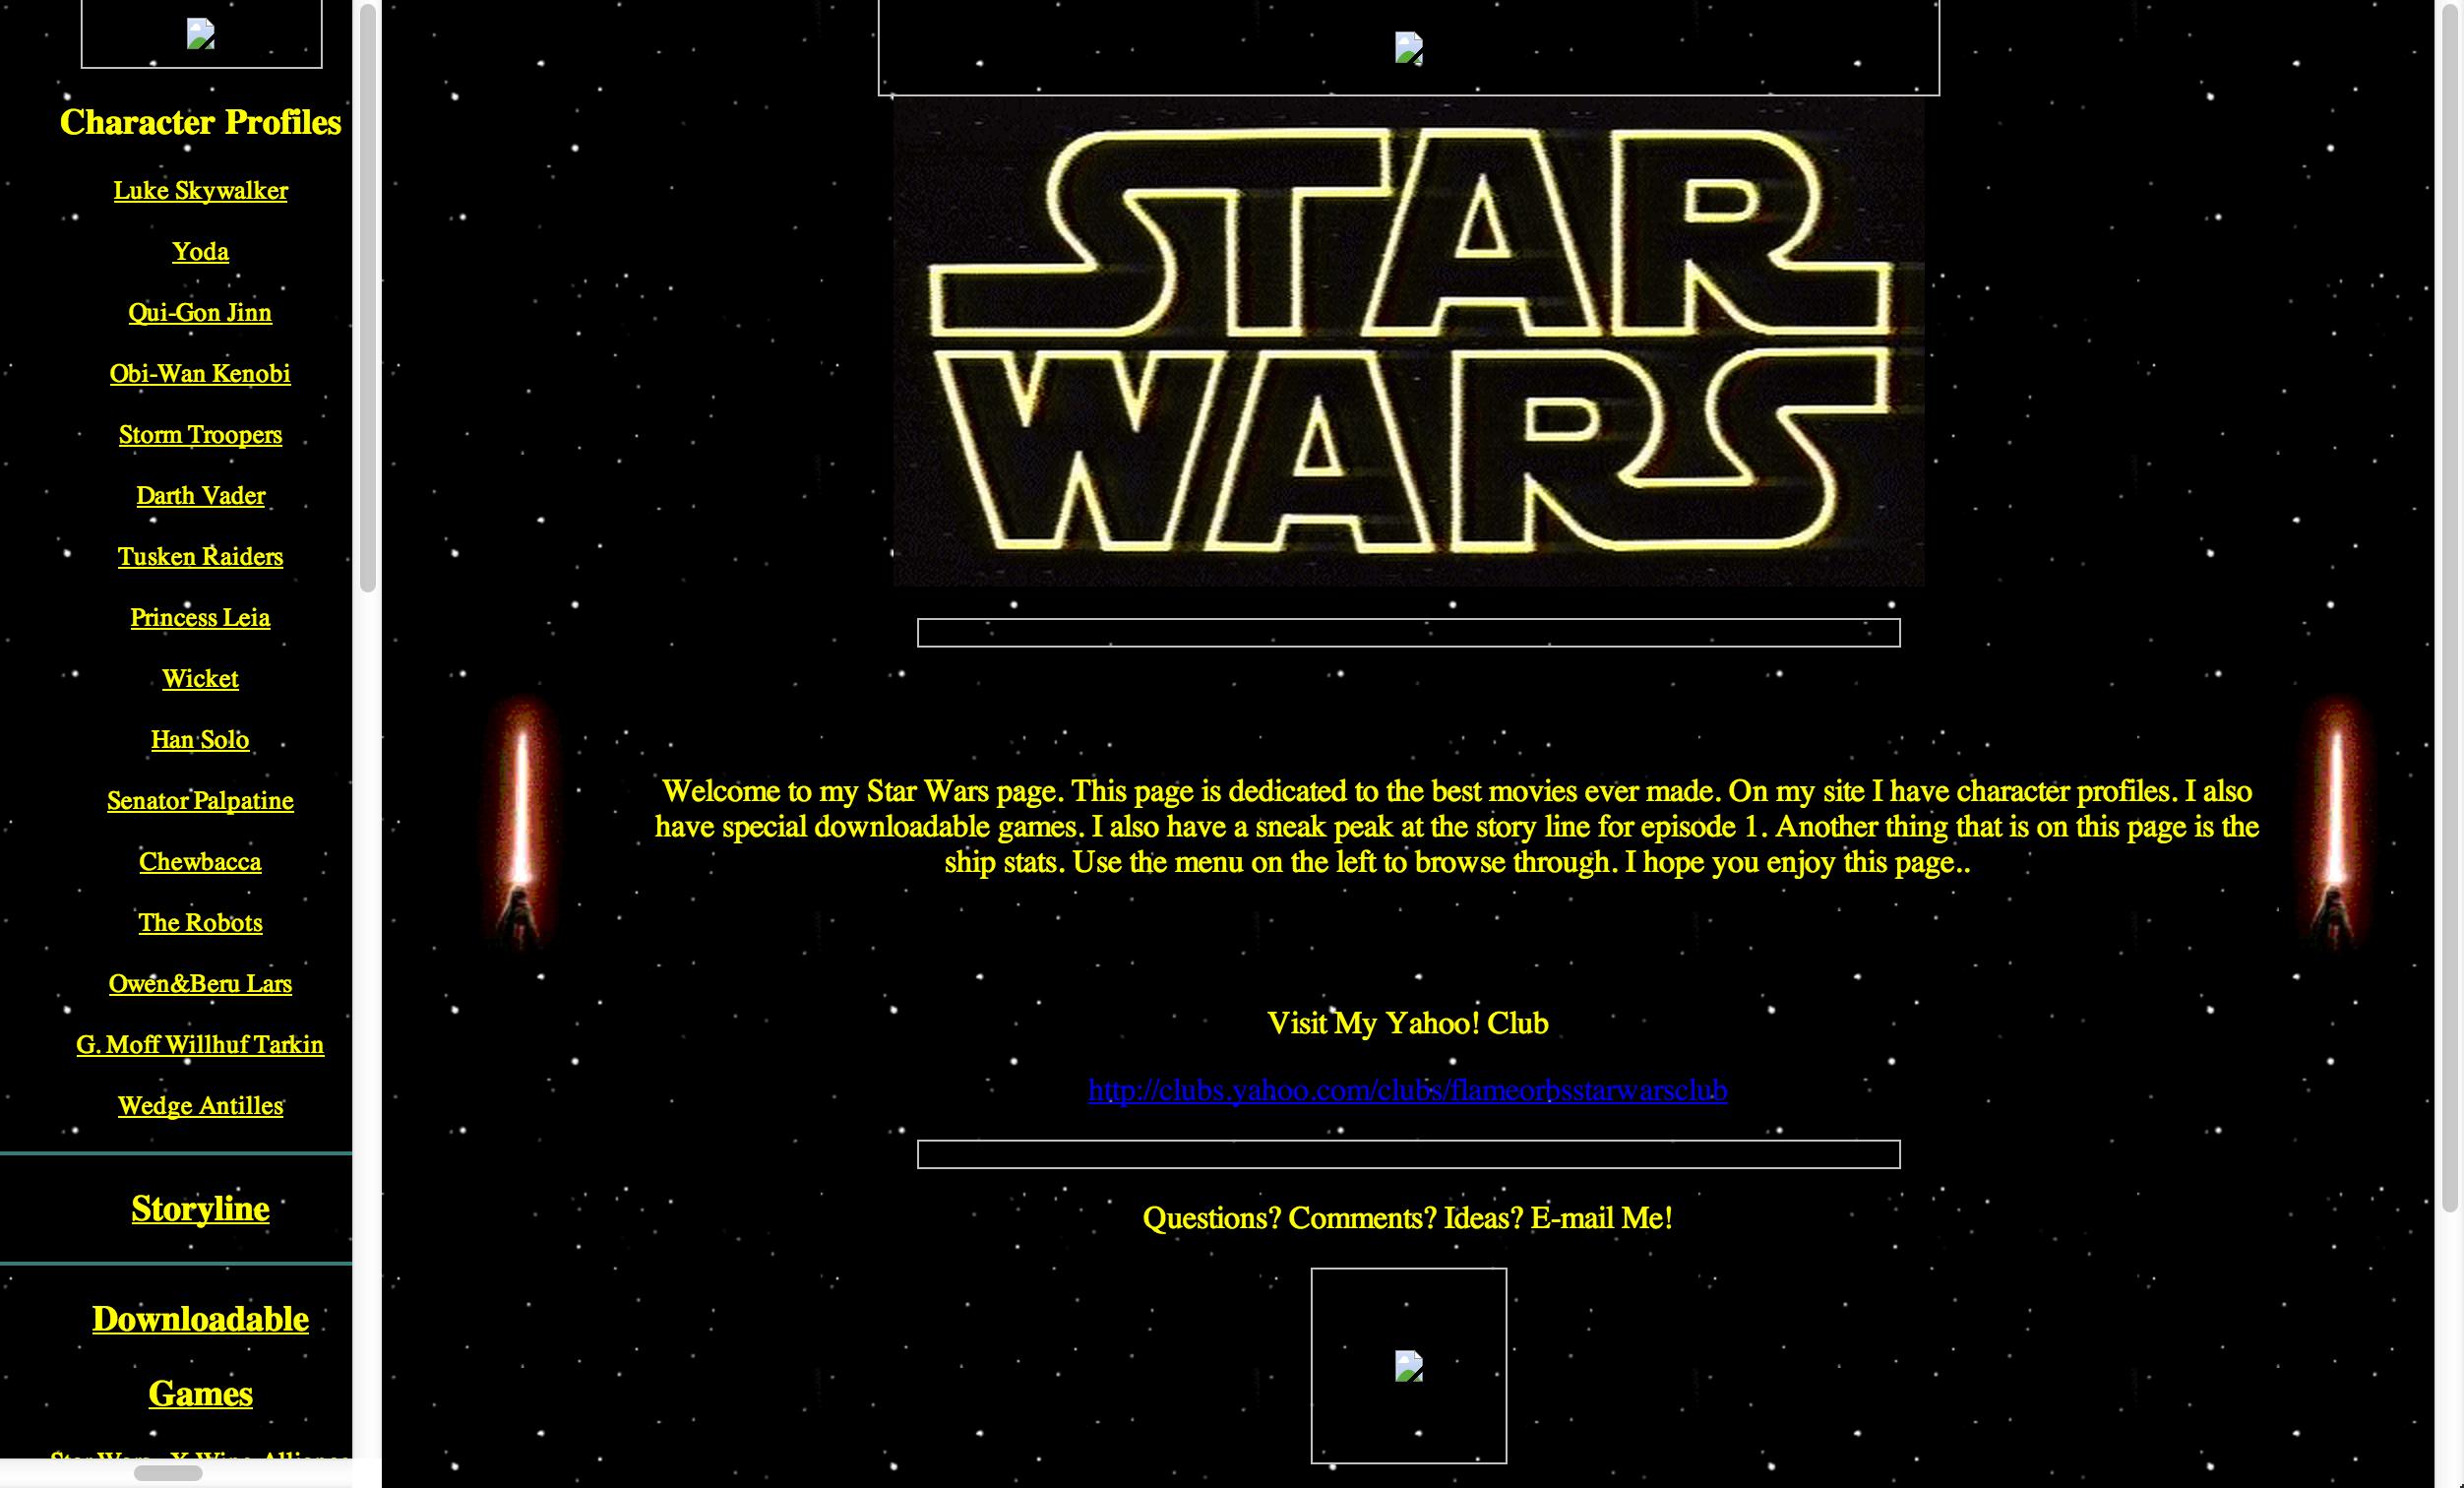 Star Wars Restoration: Main site with background